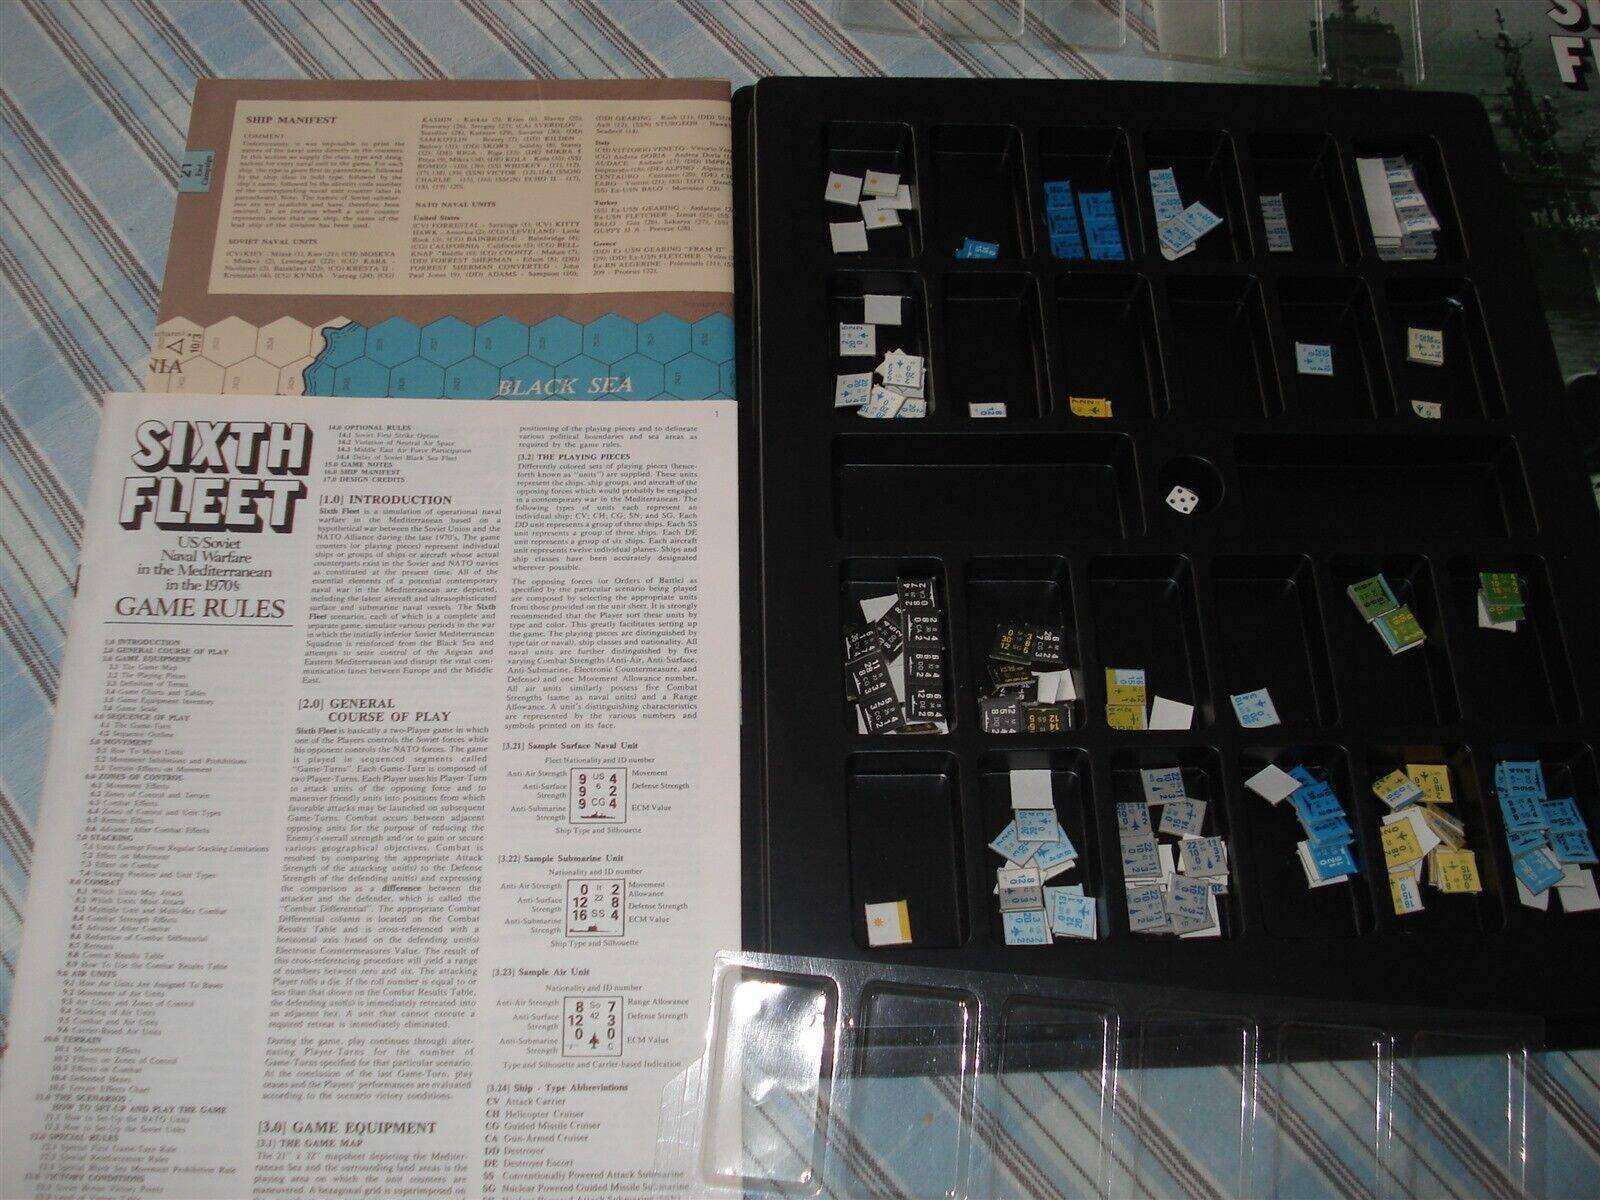 SIXTH SIXTH SIXTH FLEET GAME - SPI - 1975 - 6TH FLEET GAME - HISTORICAL SIMULATION GAME c5cf9a